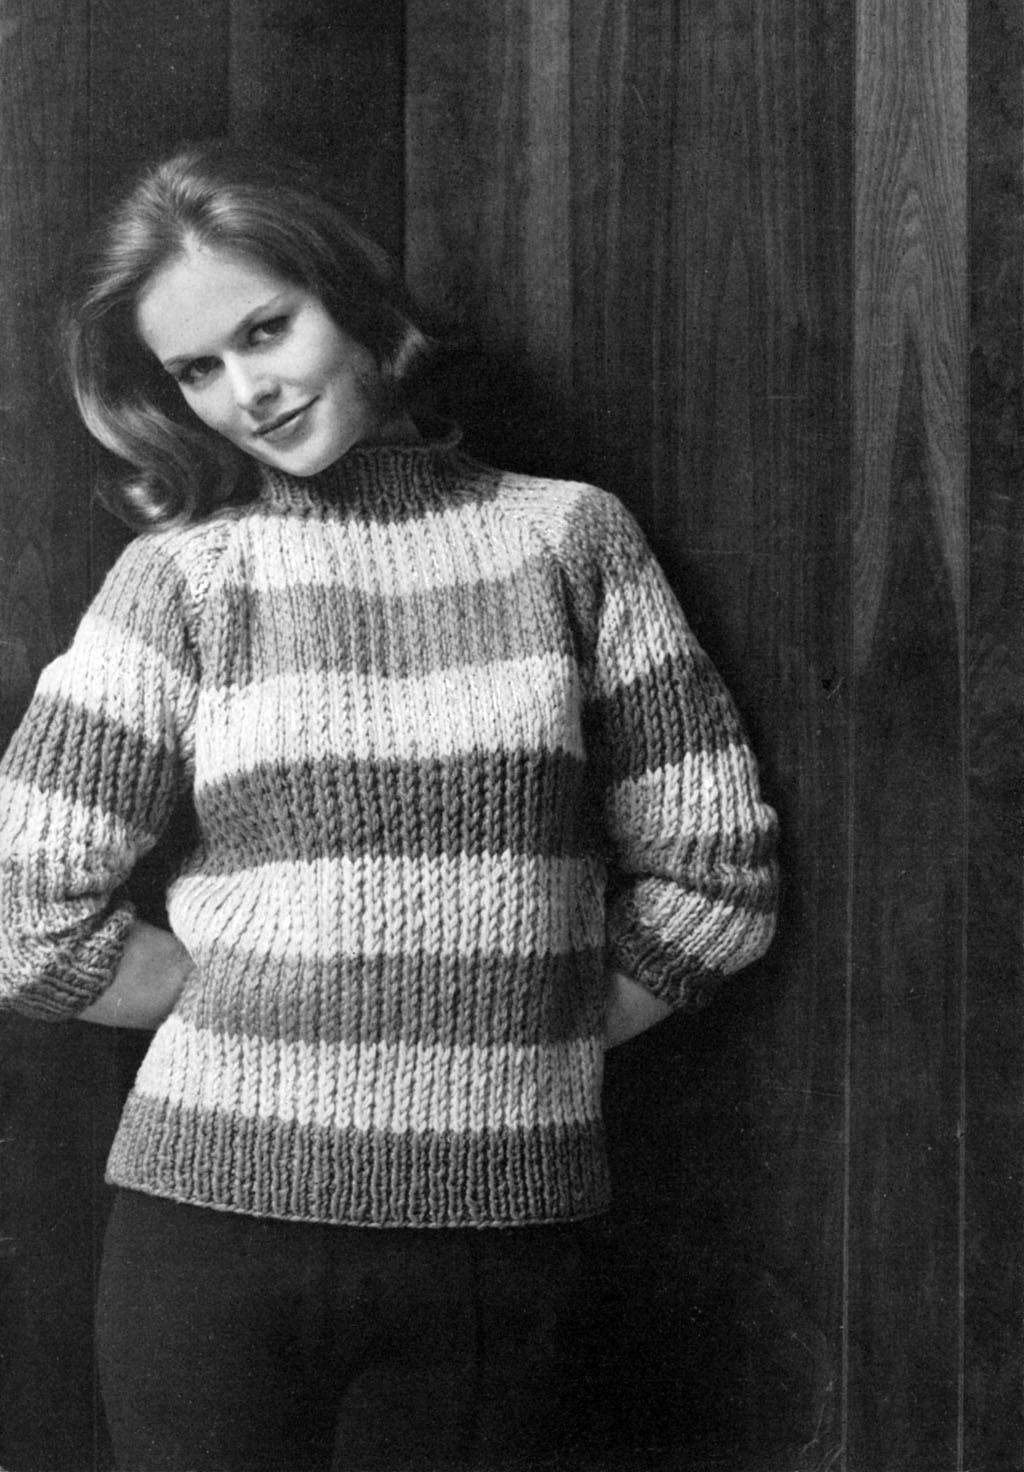 Vintage Knitting Pattern Library : The Vintage Pattern Files: 1960s Knitting - Rah Rah Stripes